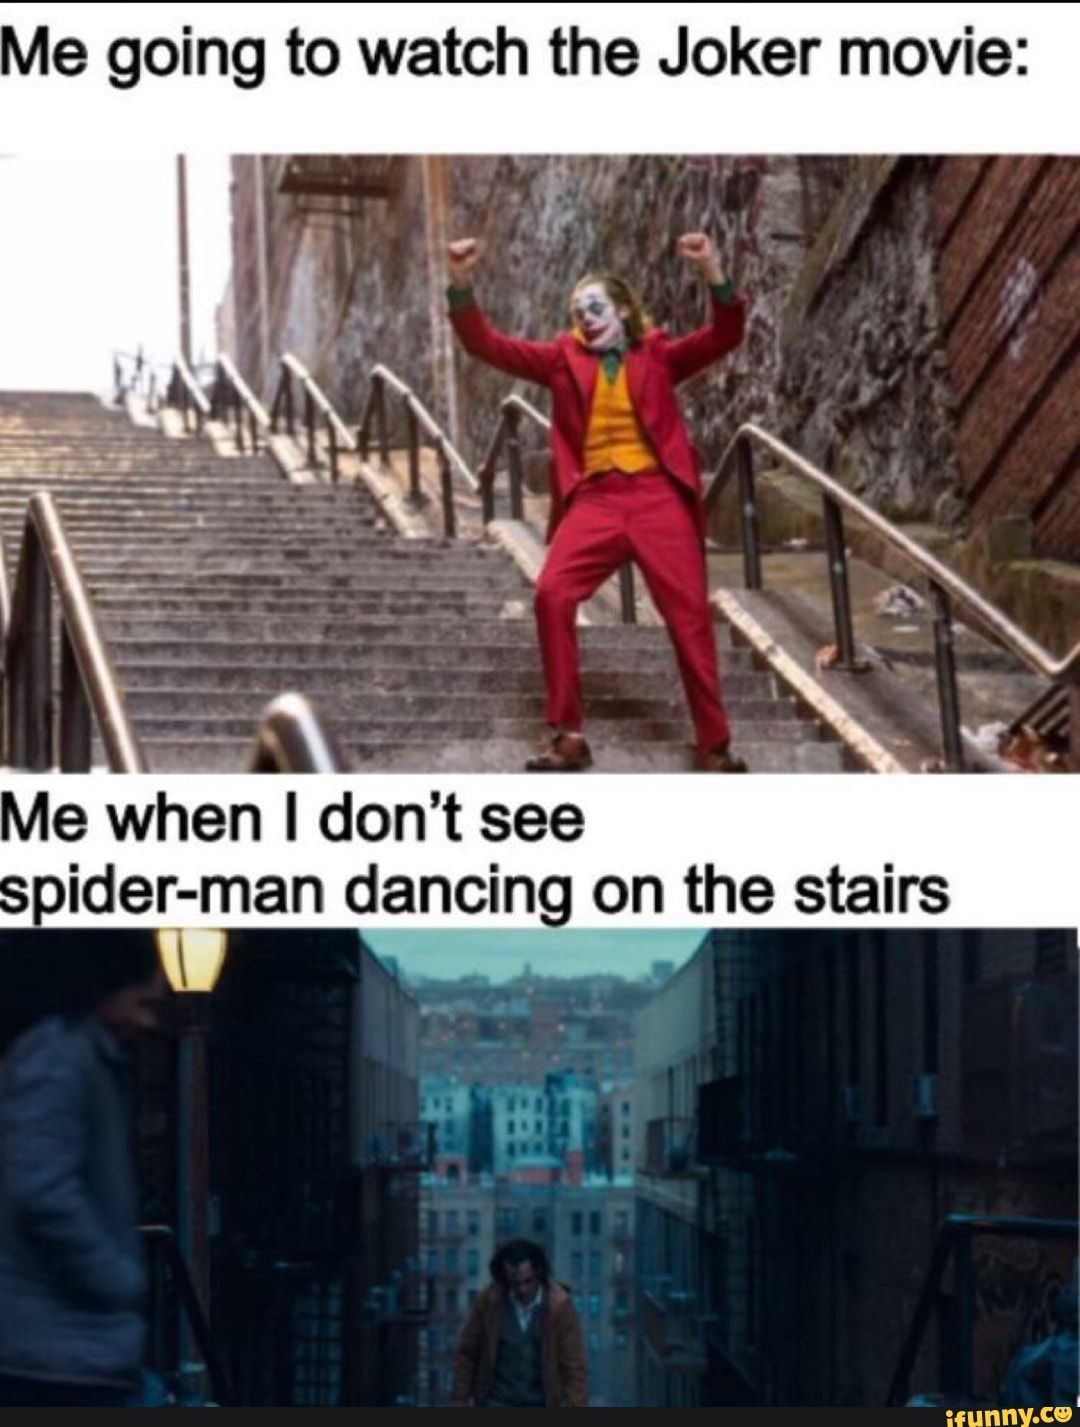 Joker Dancing Meme : joker, dancing, Going, Watch, Joker, Movie:, Don't, Oider-man, Dancing, Stairs, IFunny, Funny, Batman, Memes,, Joker,, Video, Memes